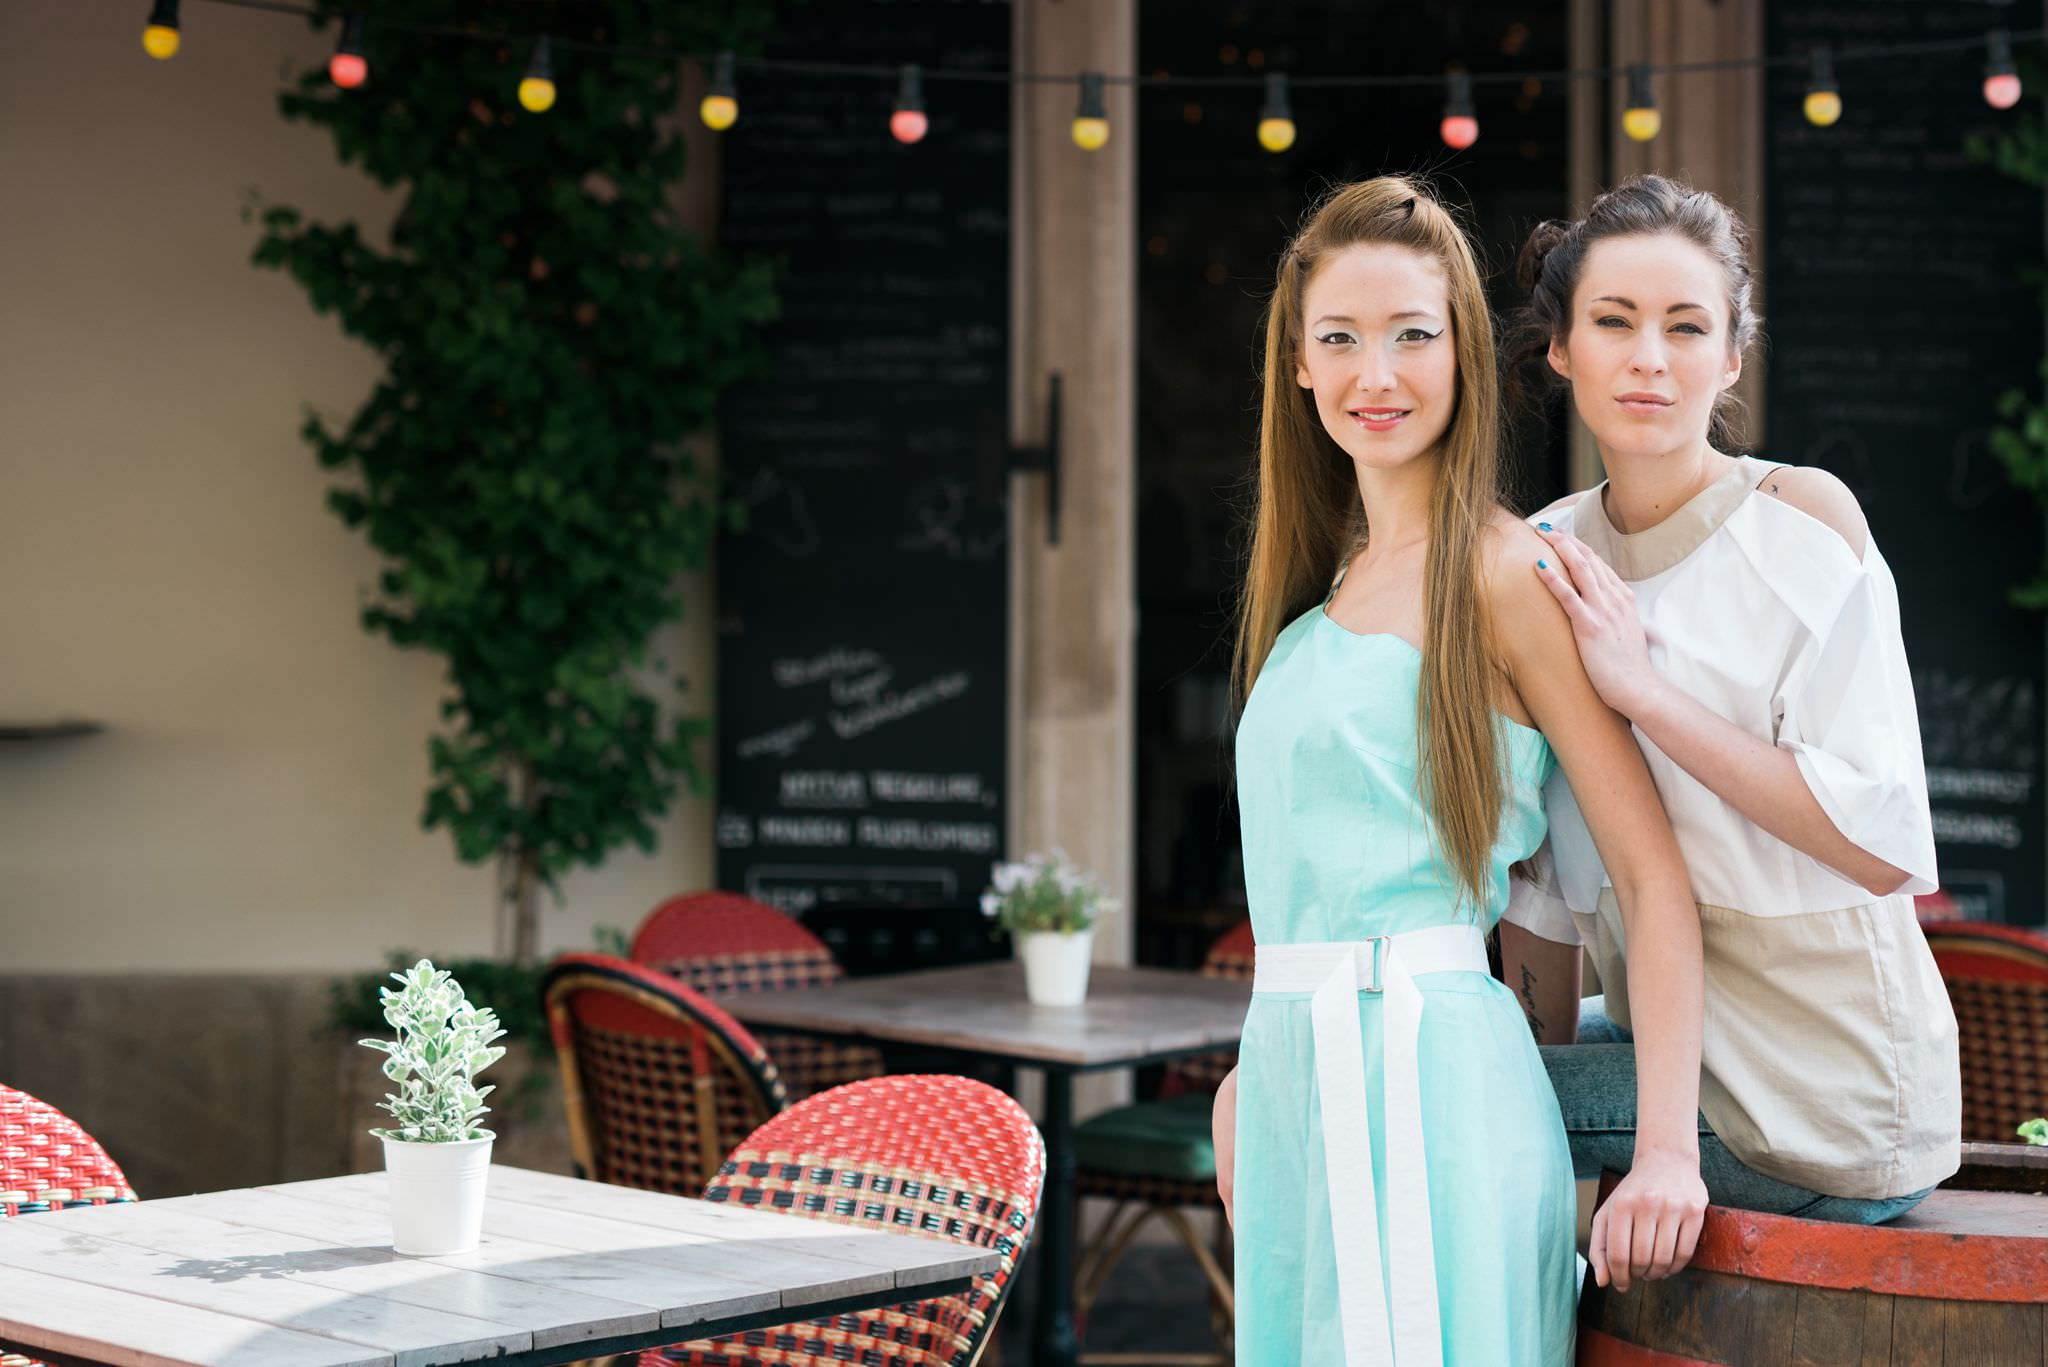 55-Rokolya_Fashion_Editorial_Lookbook_Baltazar_Budapest